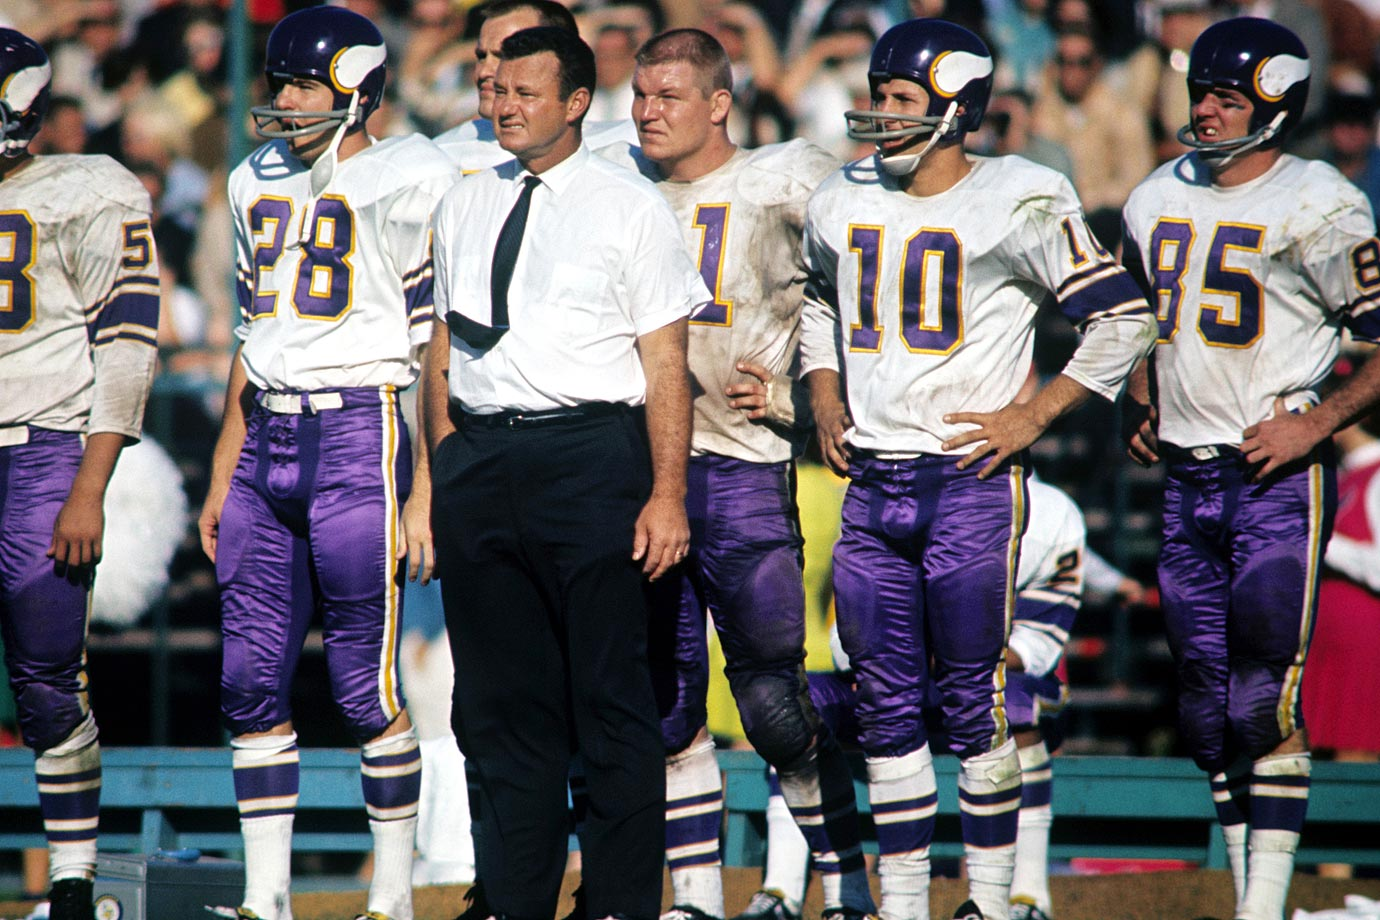 with Vikings head coach Norm Van Brocklin